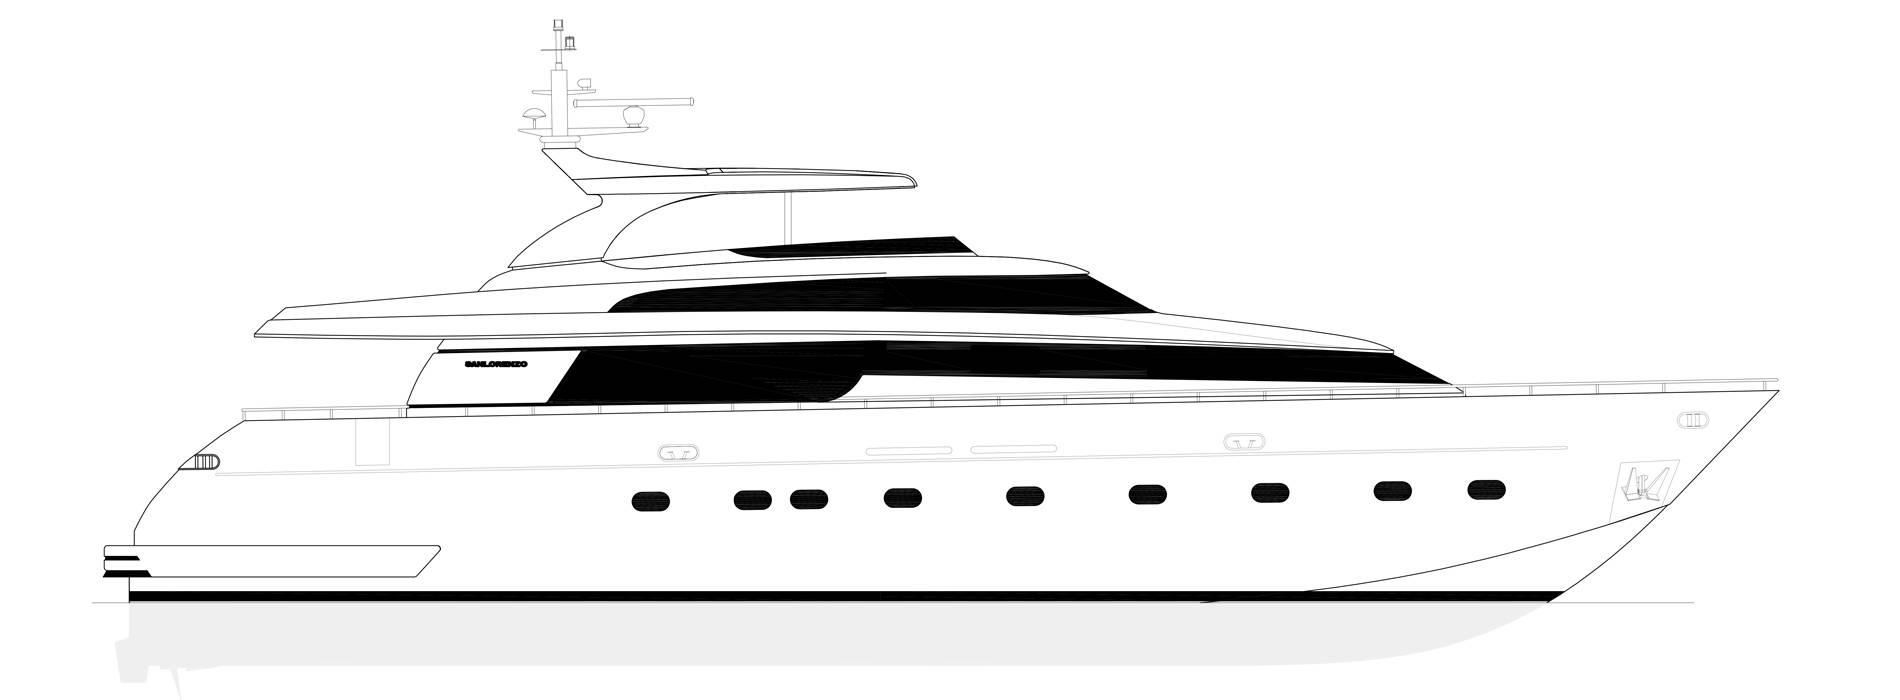 Sanlorenzo Yachts SL88-541 Perfil